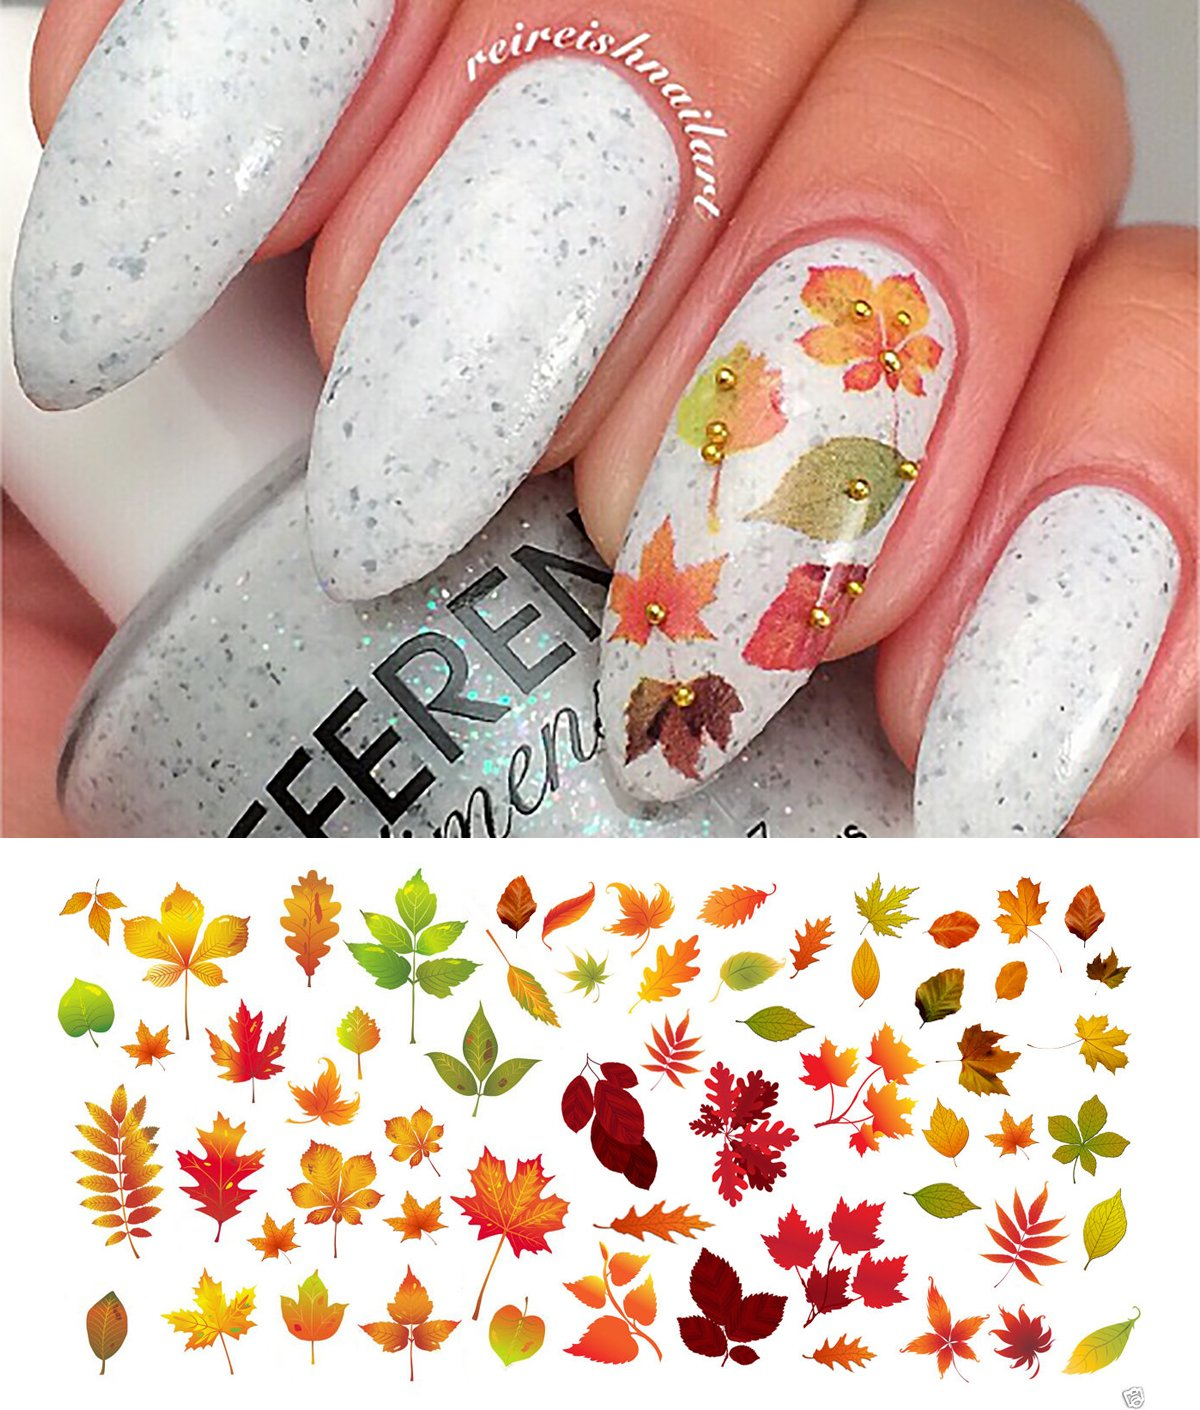 Amazon.com : Autumn Leaves Nail Art Water Slide Tattoo Sticker ...